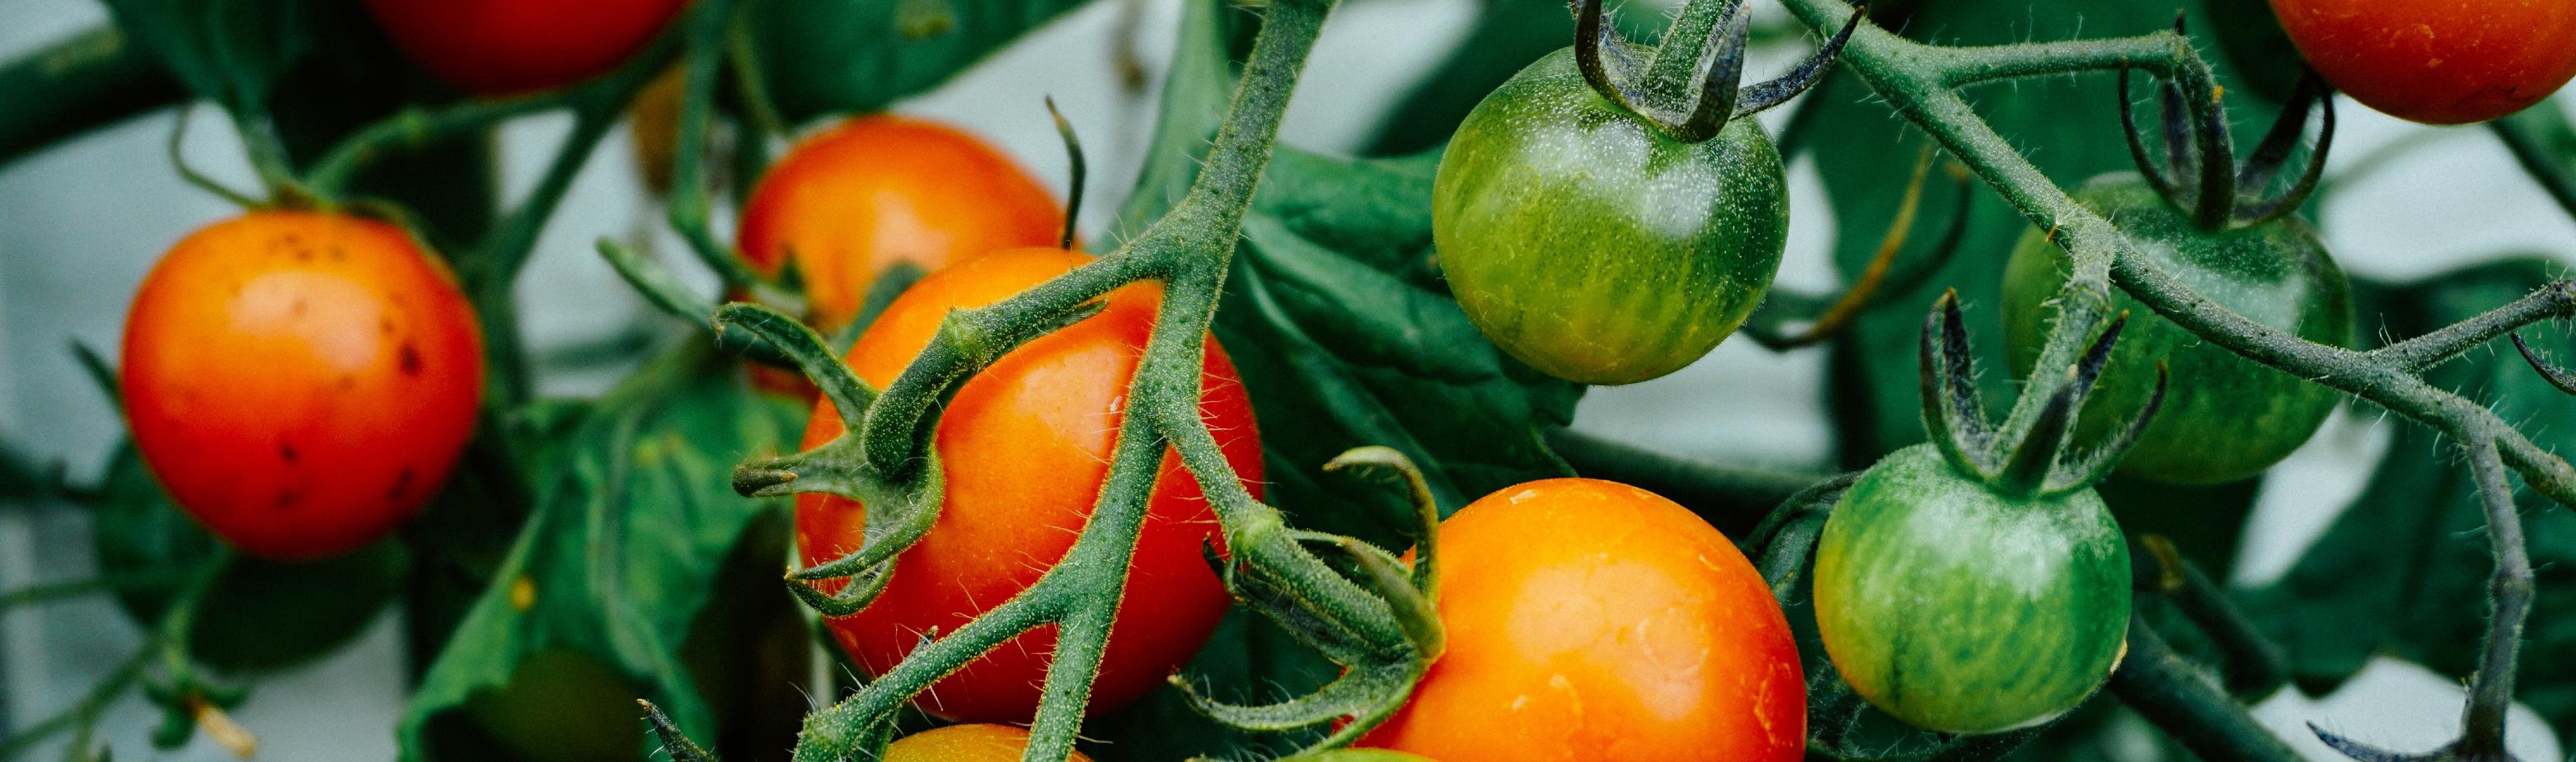 Hjemmedyrket tomater